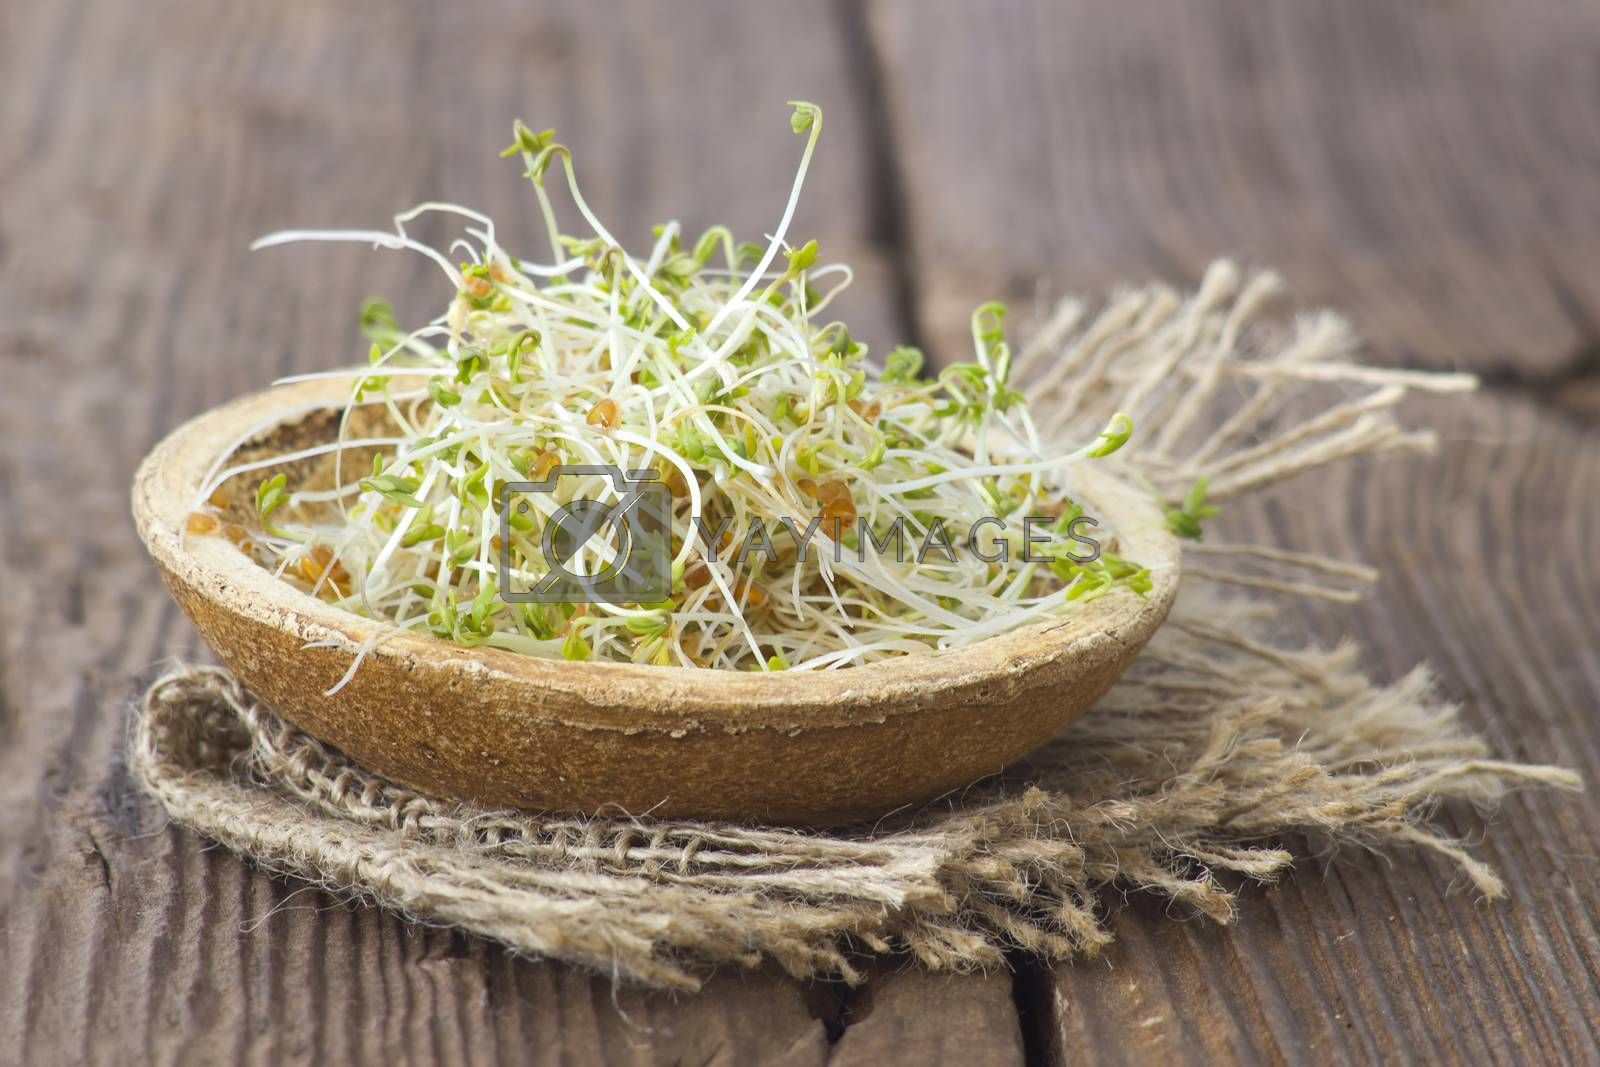 garden cress sprouts